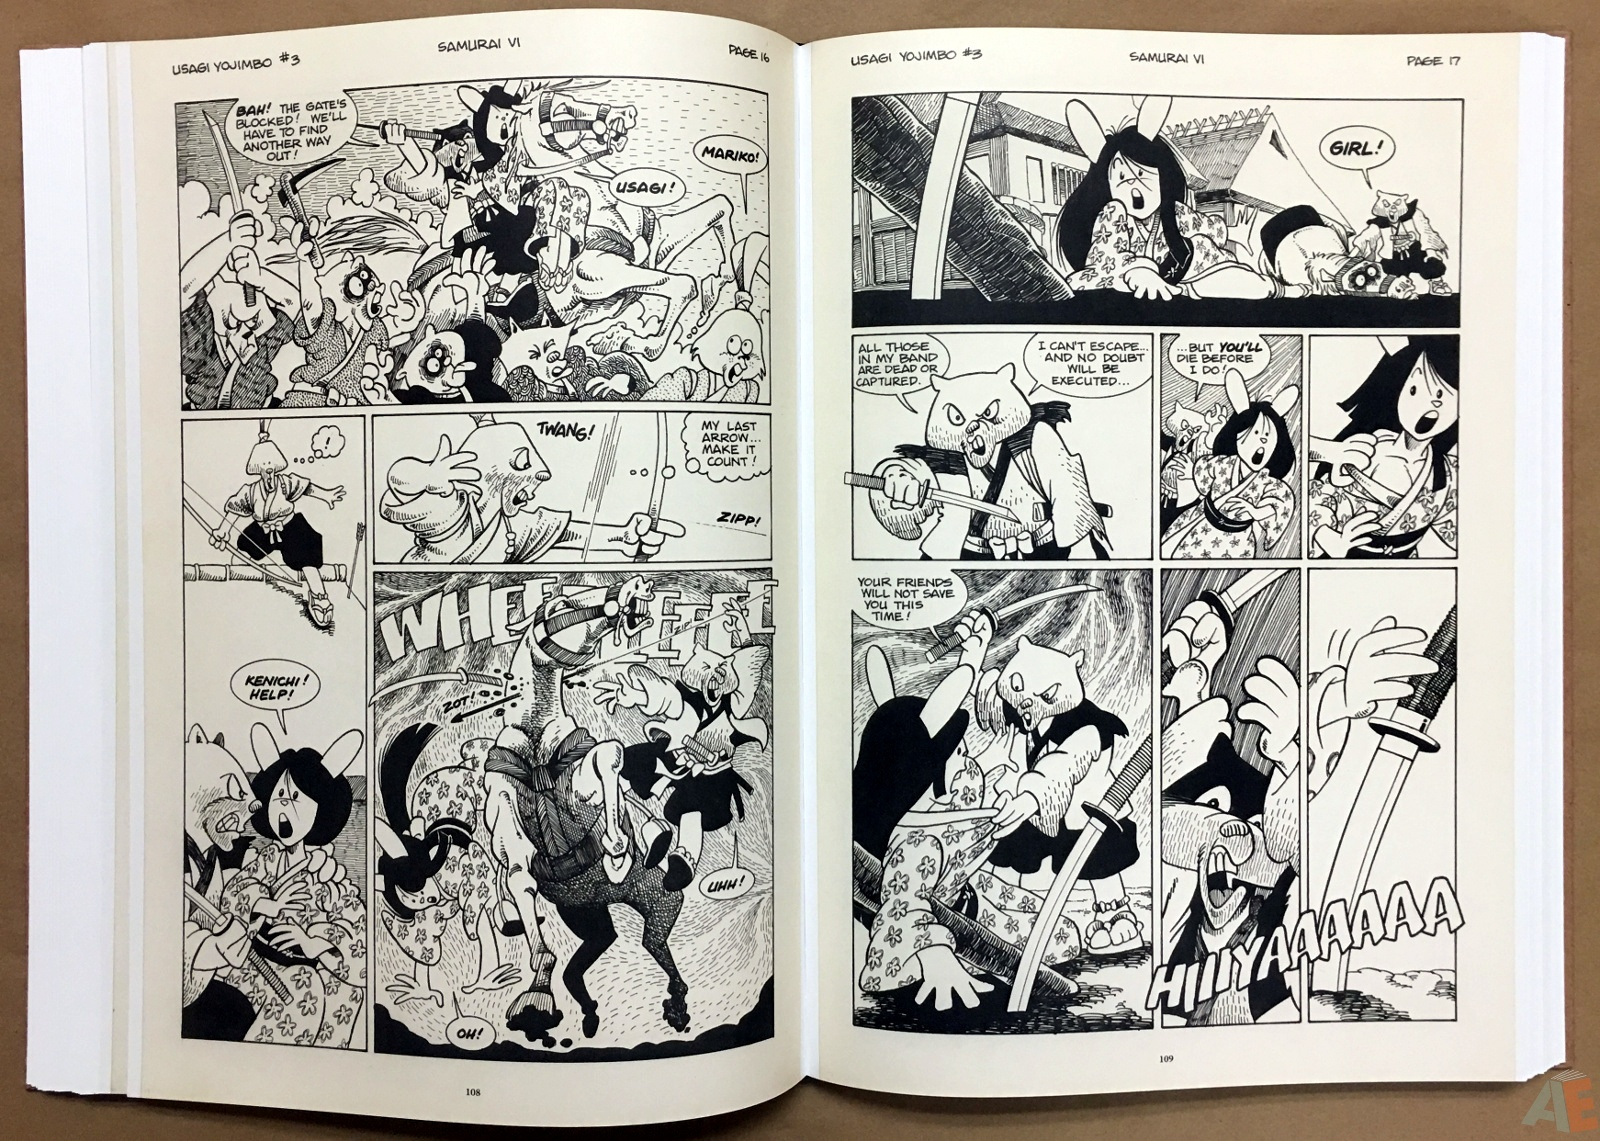 Usagi Yojimbo: Samurai and Other Stories Gallery Edition 22